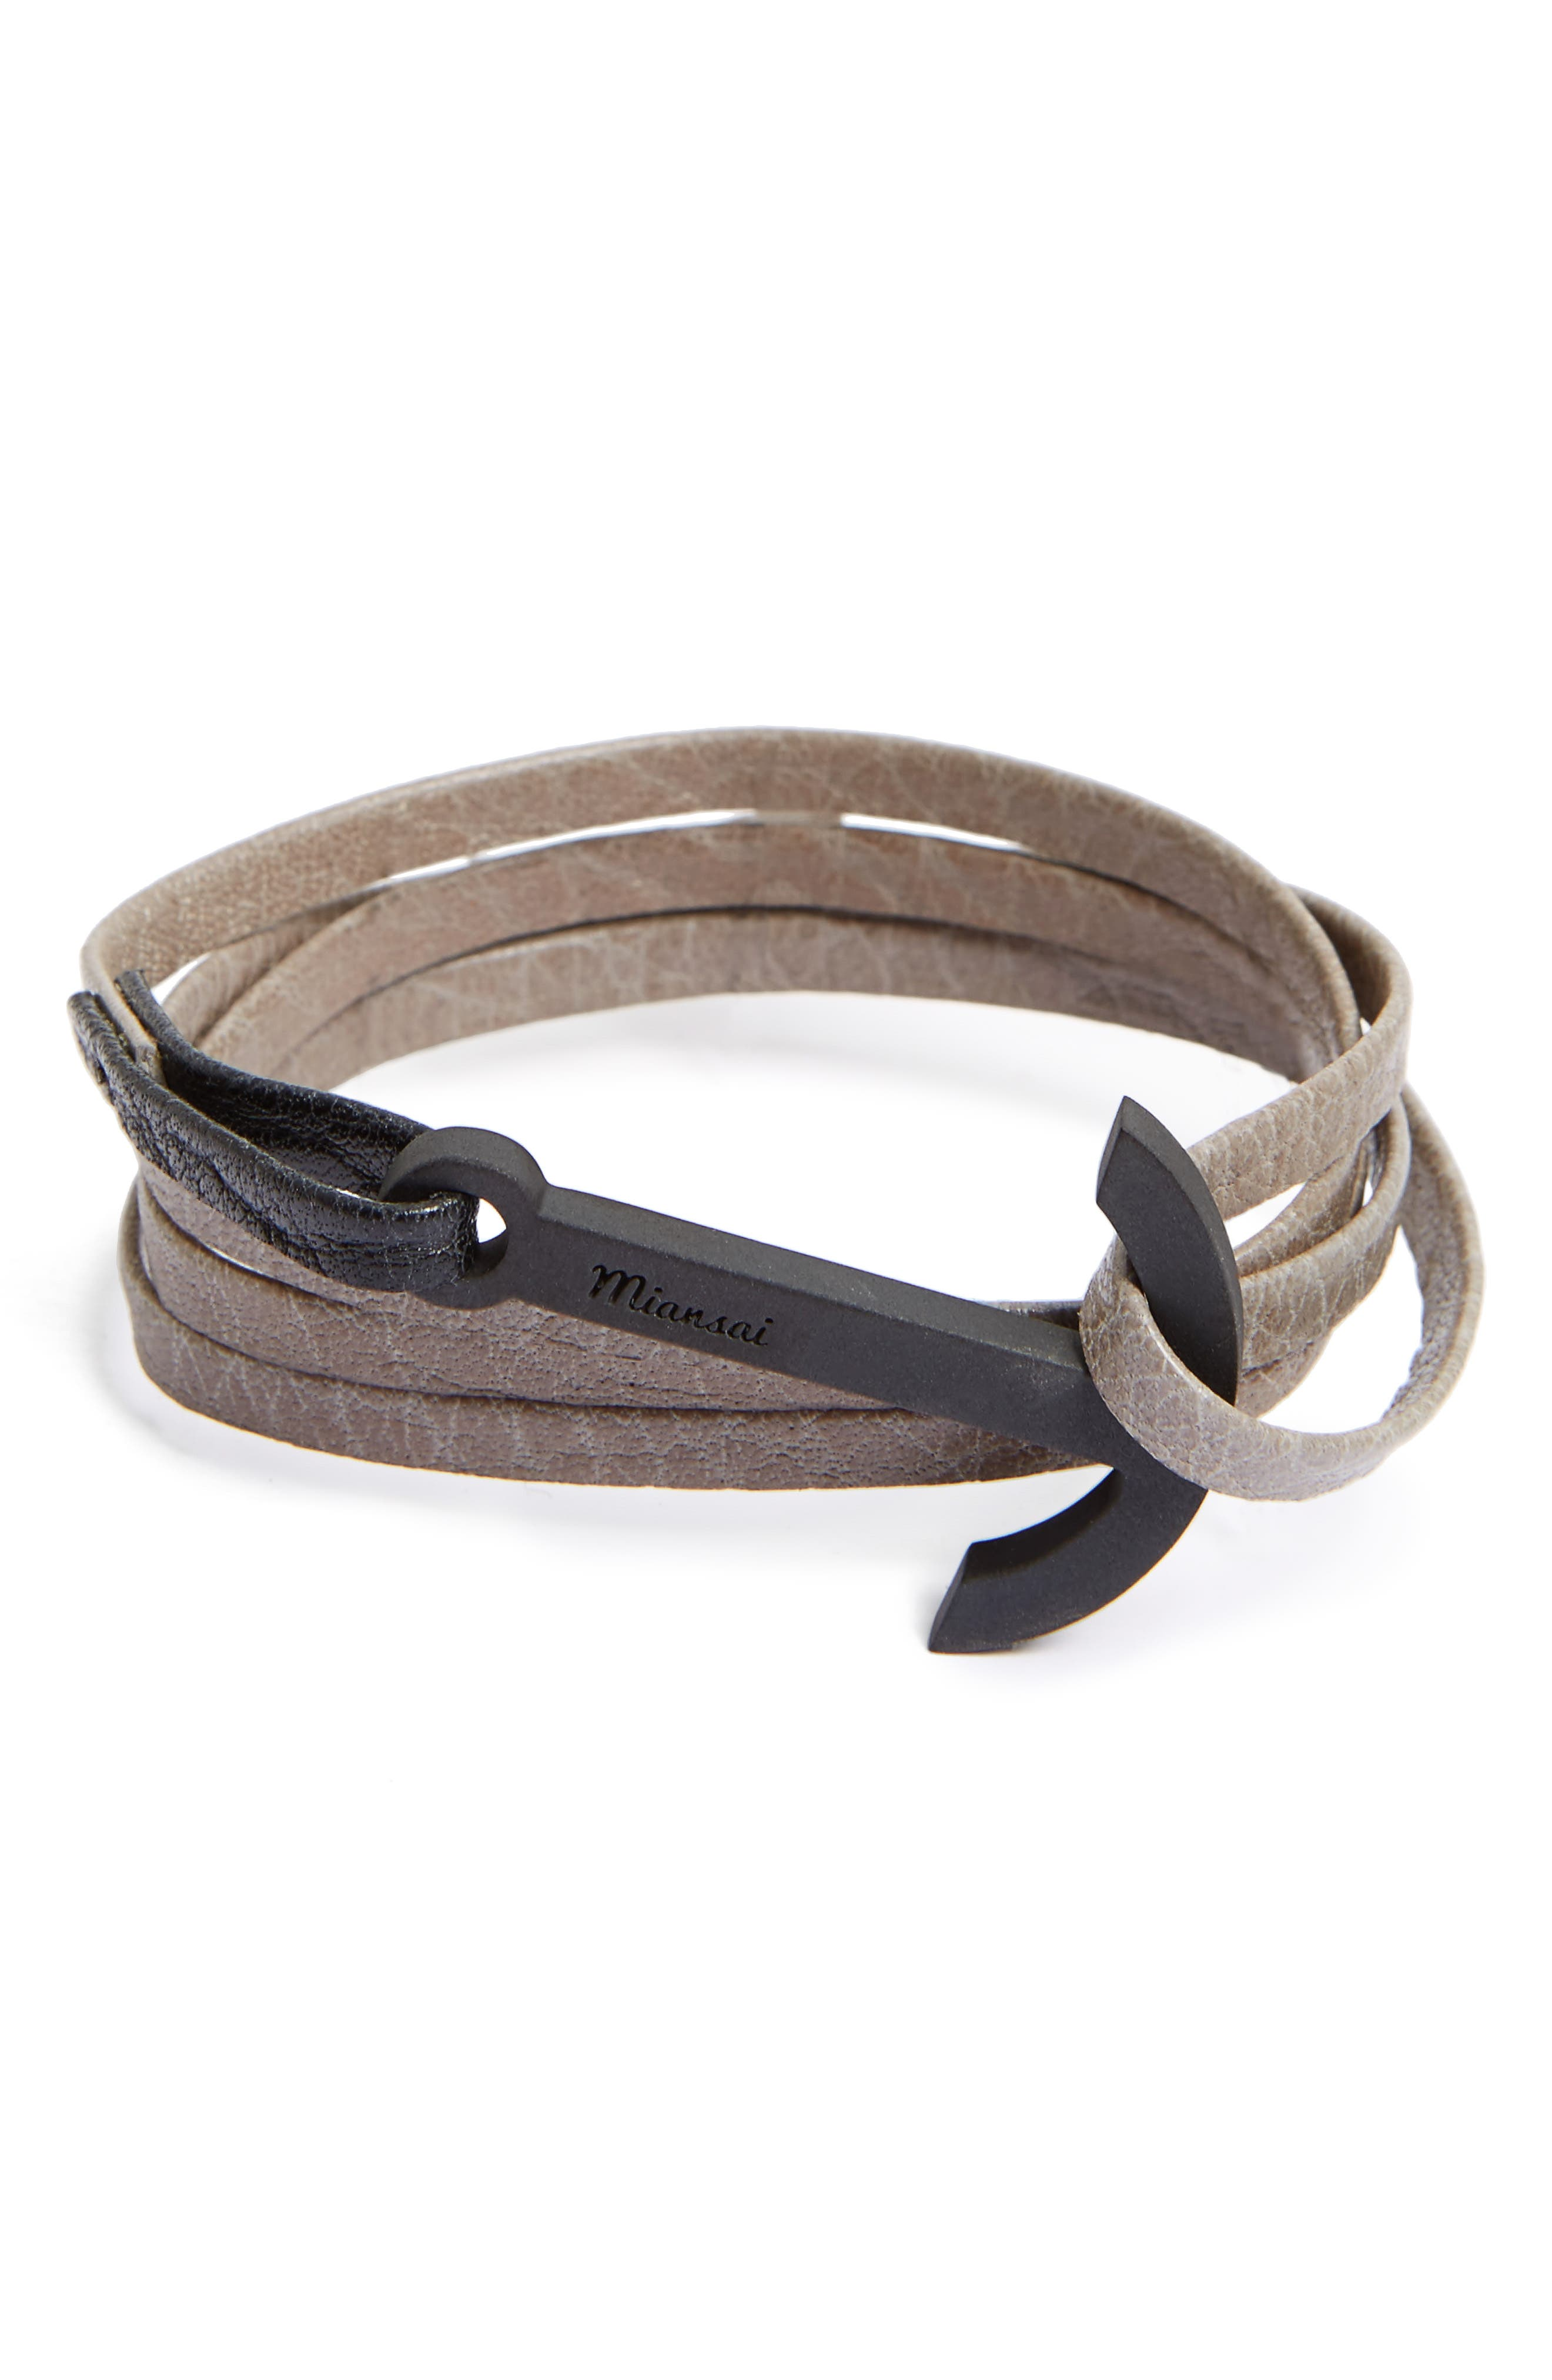 Alternate Image 1 Selected - Miansai Modern Anchor Leather Wrap Bracelet